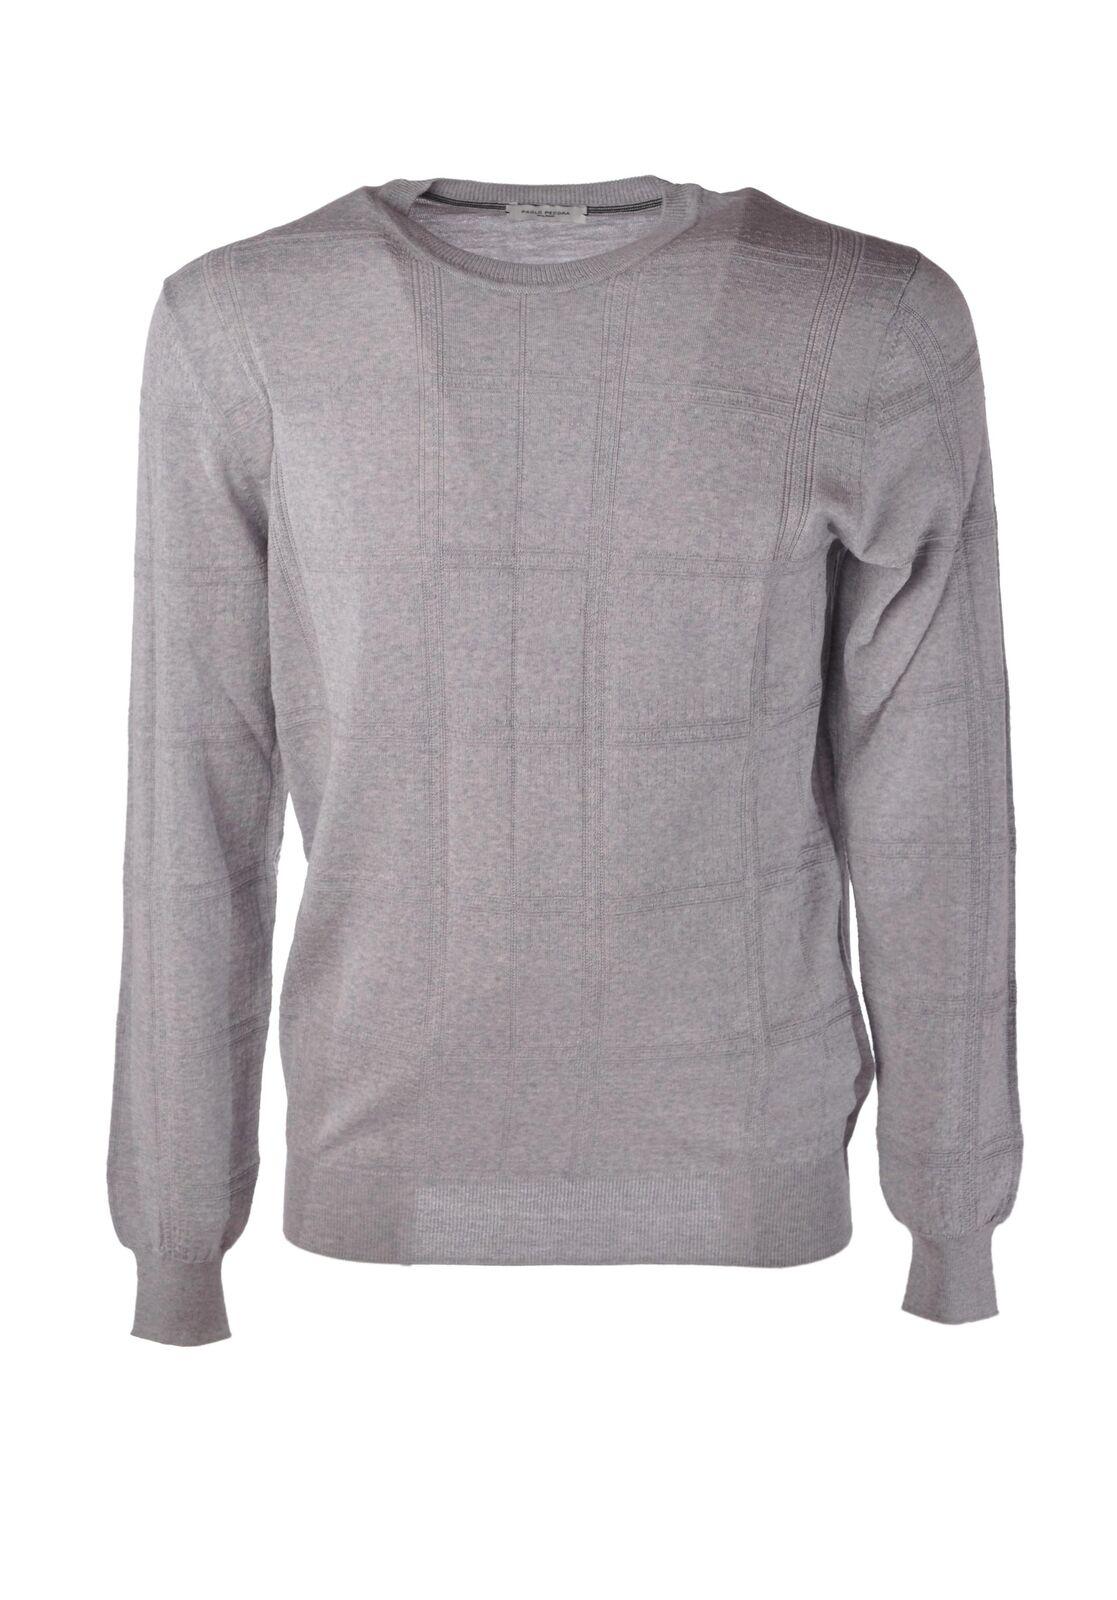 Paolo Pecora  -  Sweaters - Male - grau - 4103702A183920